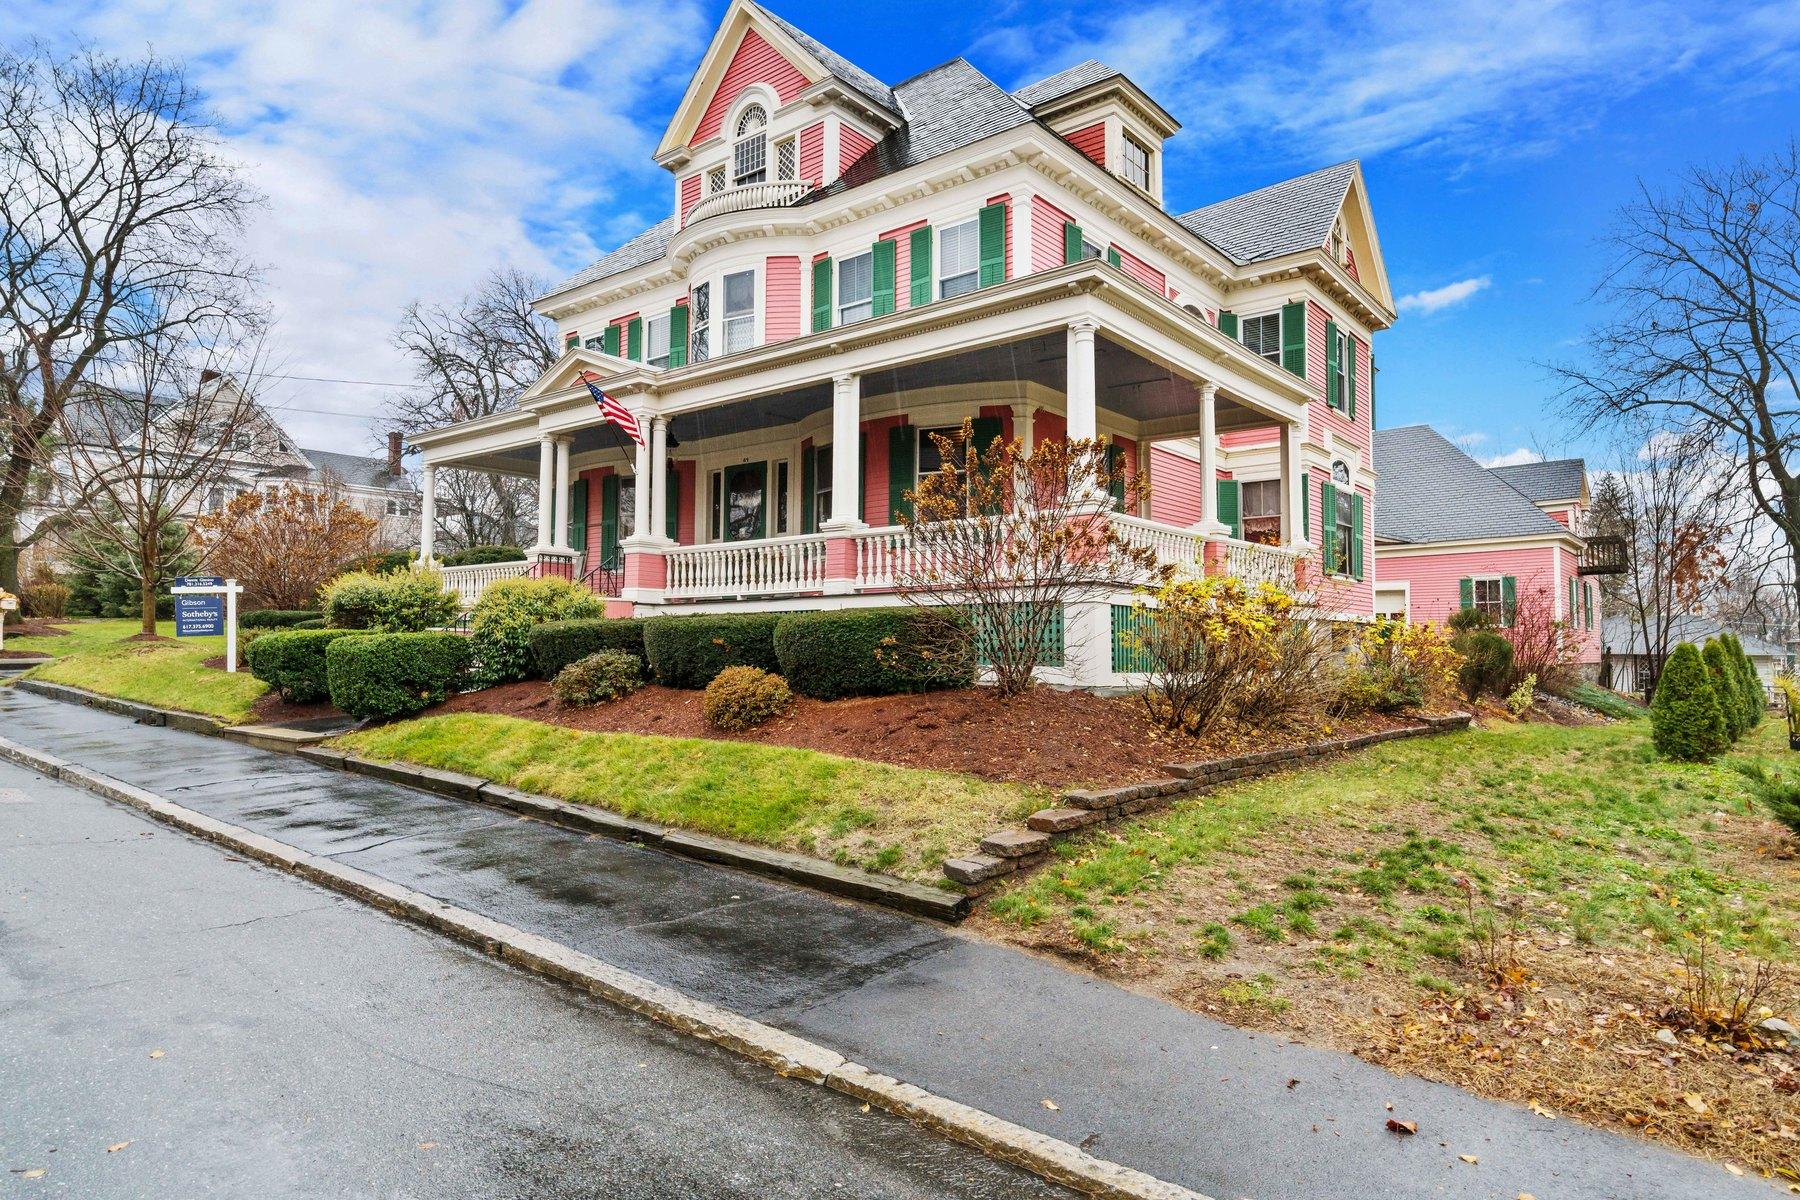 Частный односемейный дом для того Продажа на Beautiful Colonial Revival Home And Carriage House 89-95 Harvard Street Lowell, Массачусетс, 01851 Соединенные Штаты